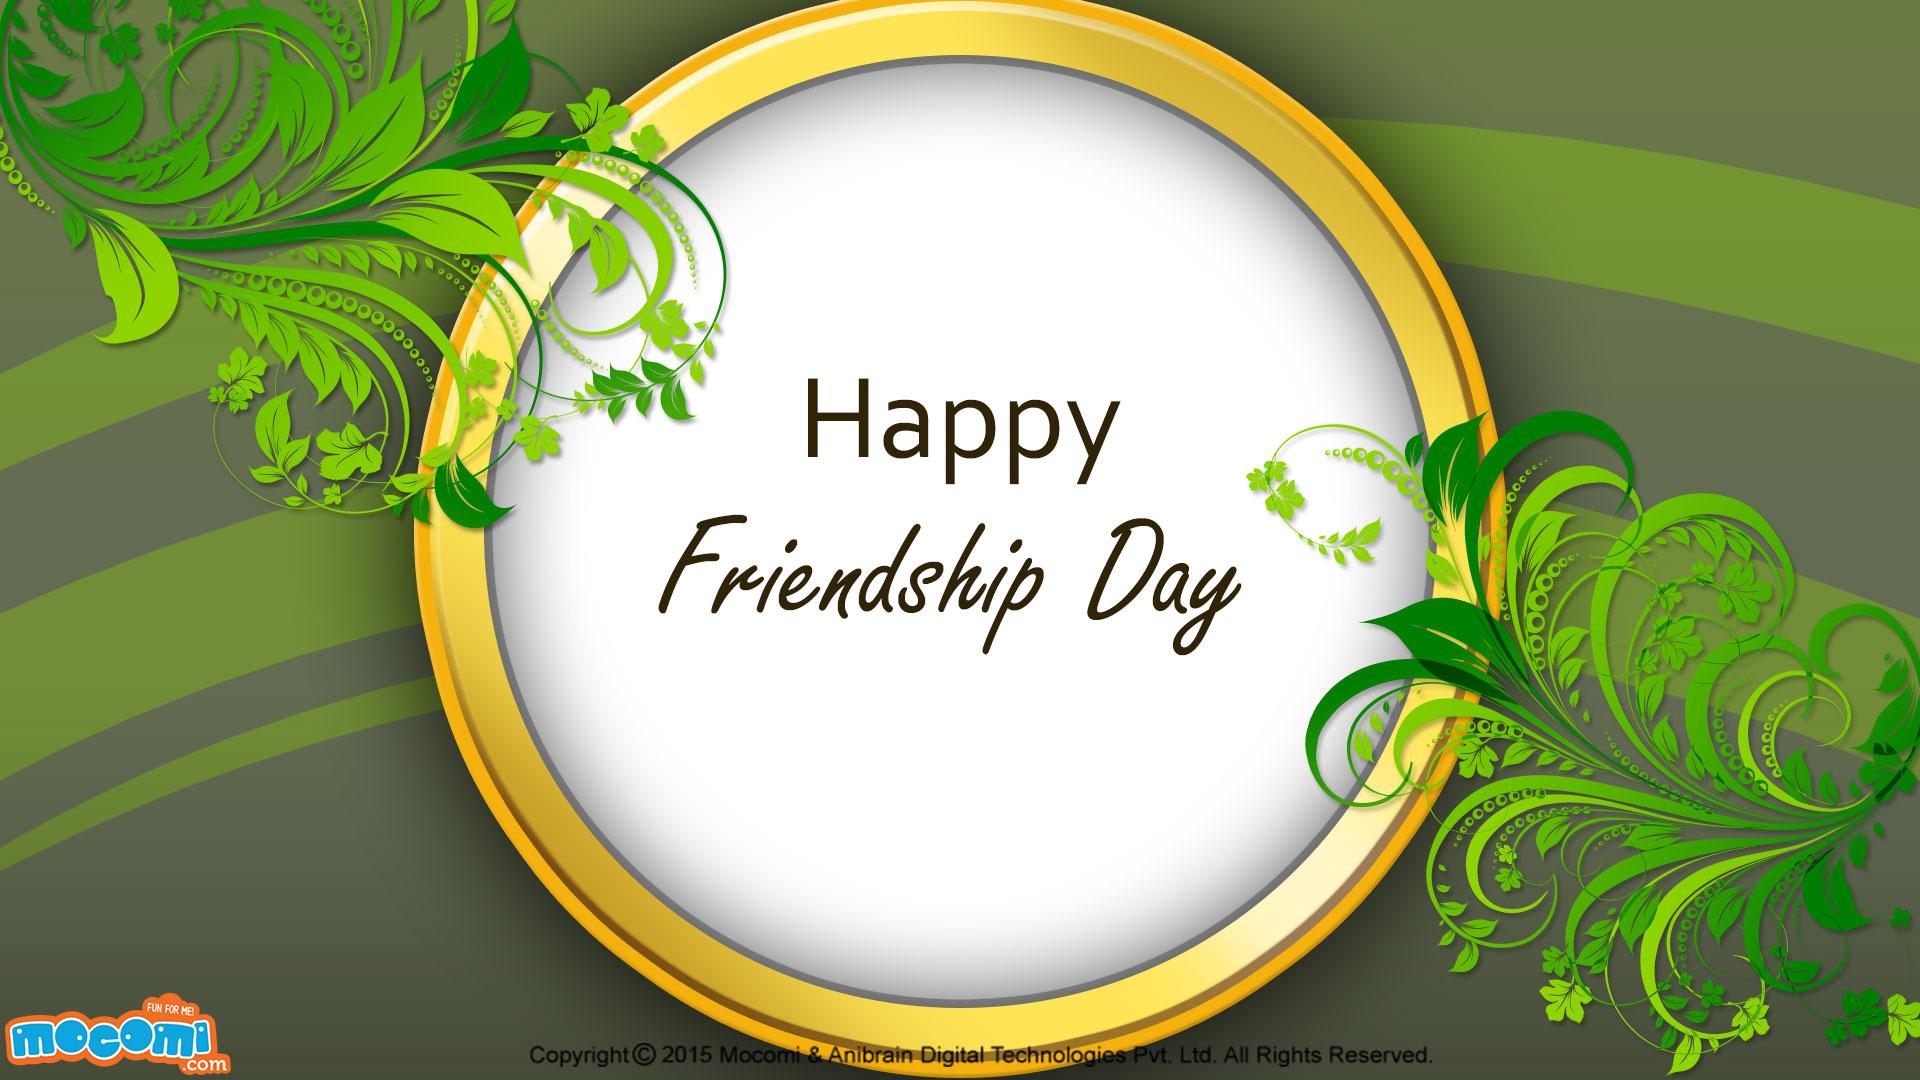 Happy Friendship Day Wallpaper – 06. «